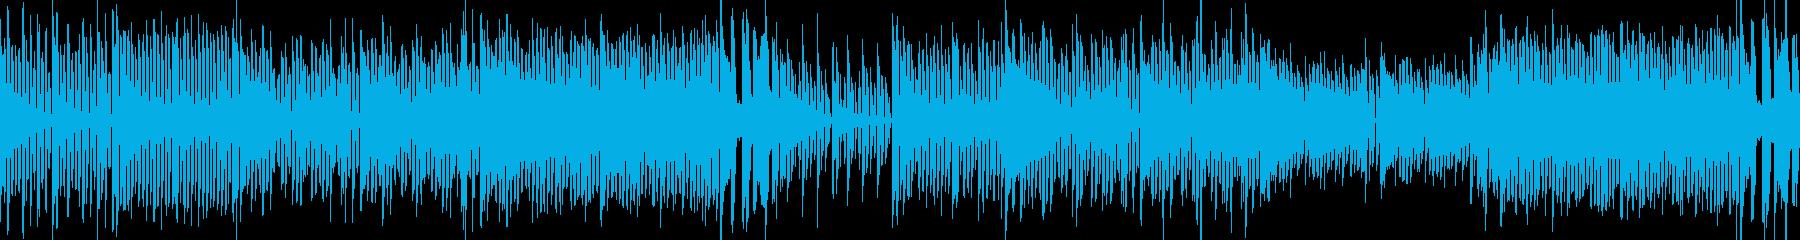 8bitゲームの街 ピコピコ ループの再生済みの波形